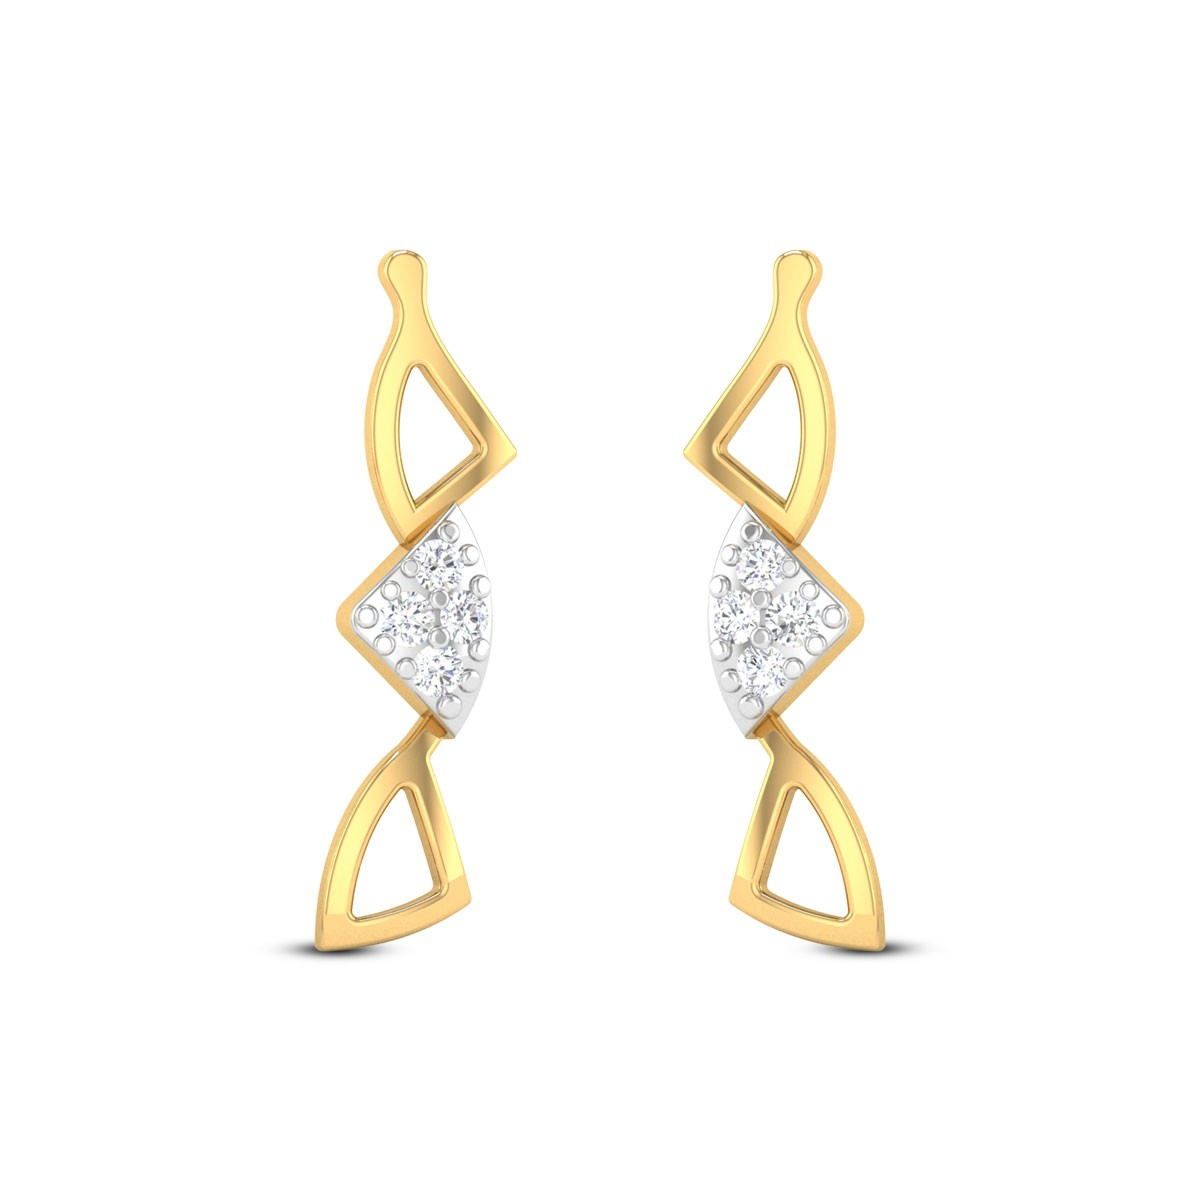 Congruent Triangles Diamond Earrings